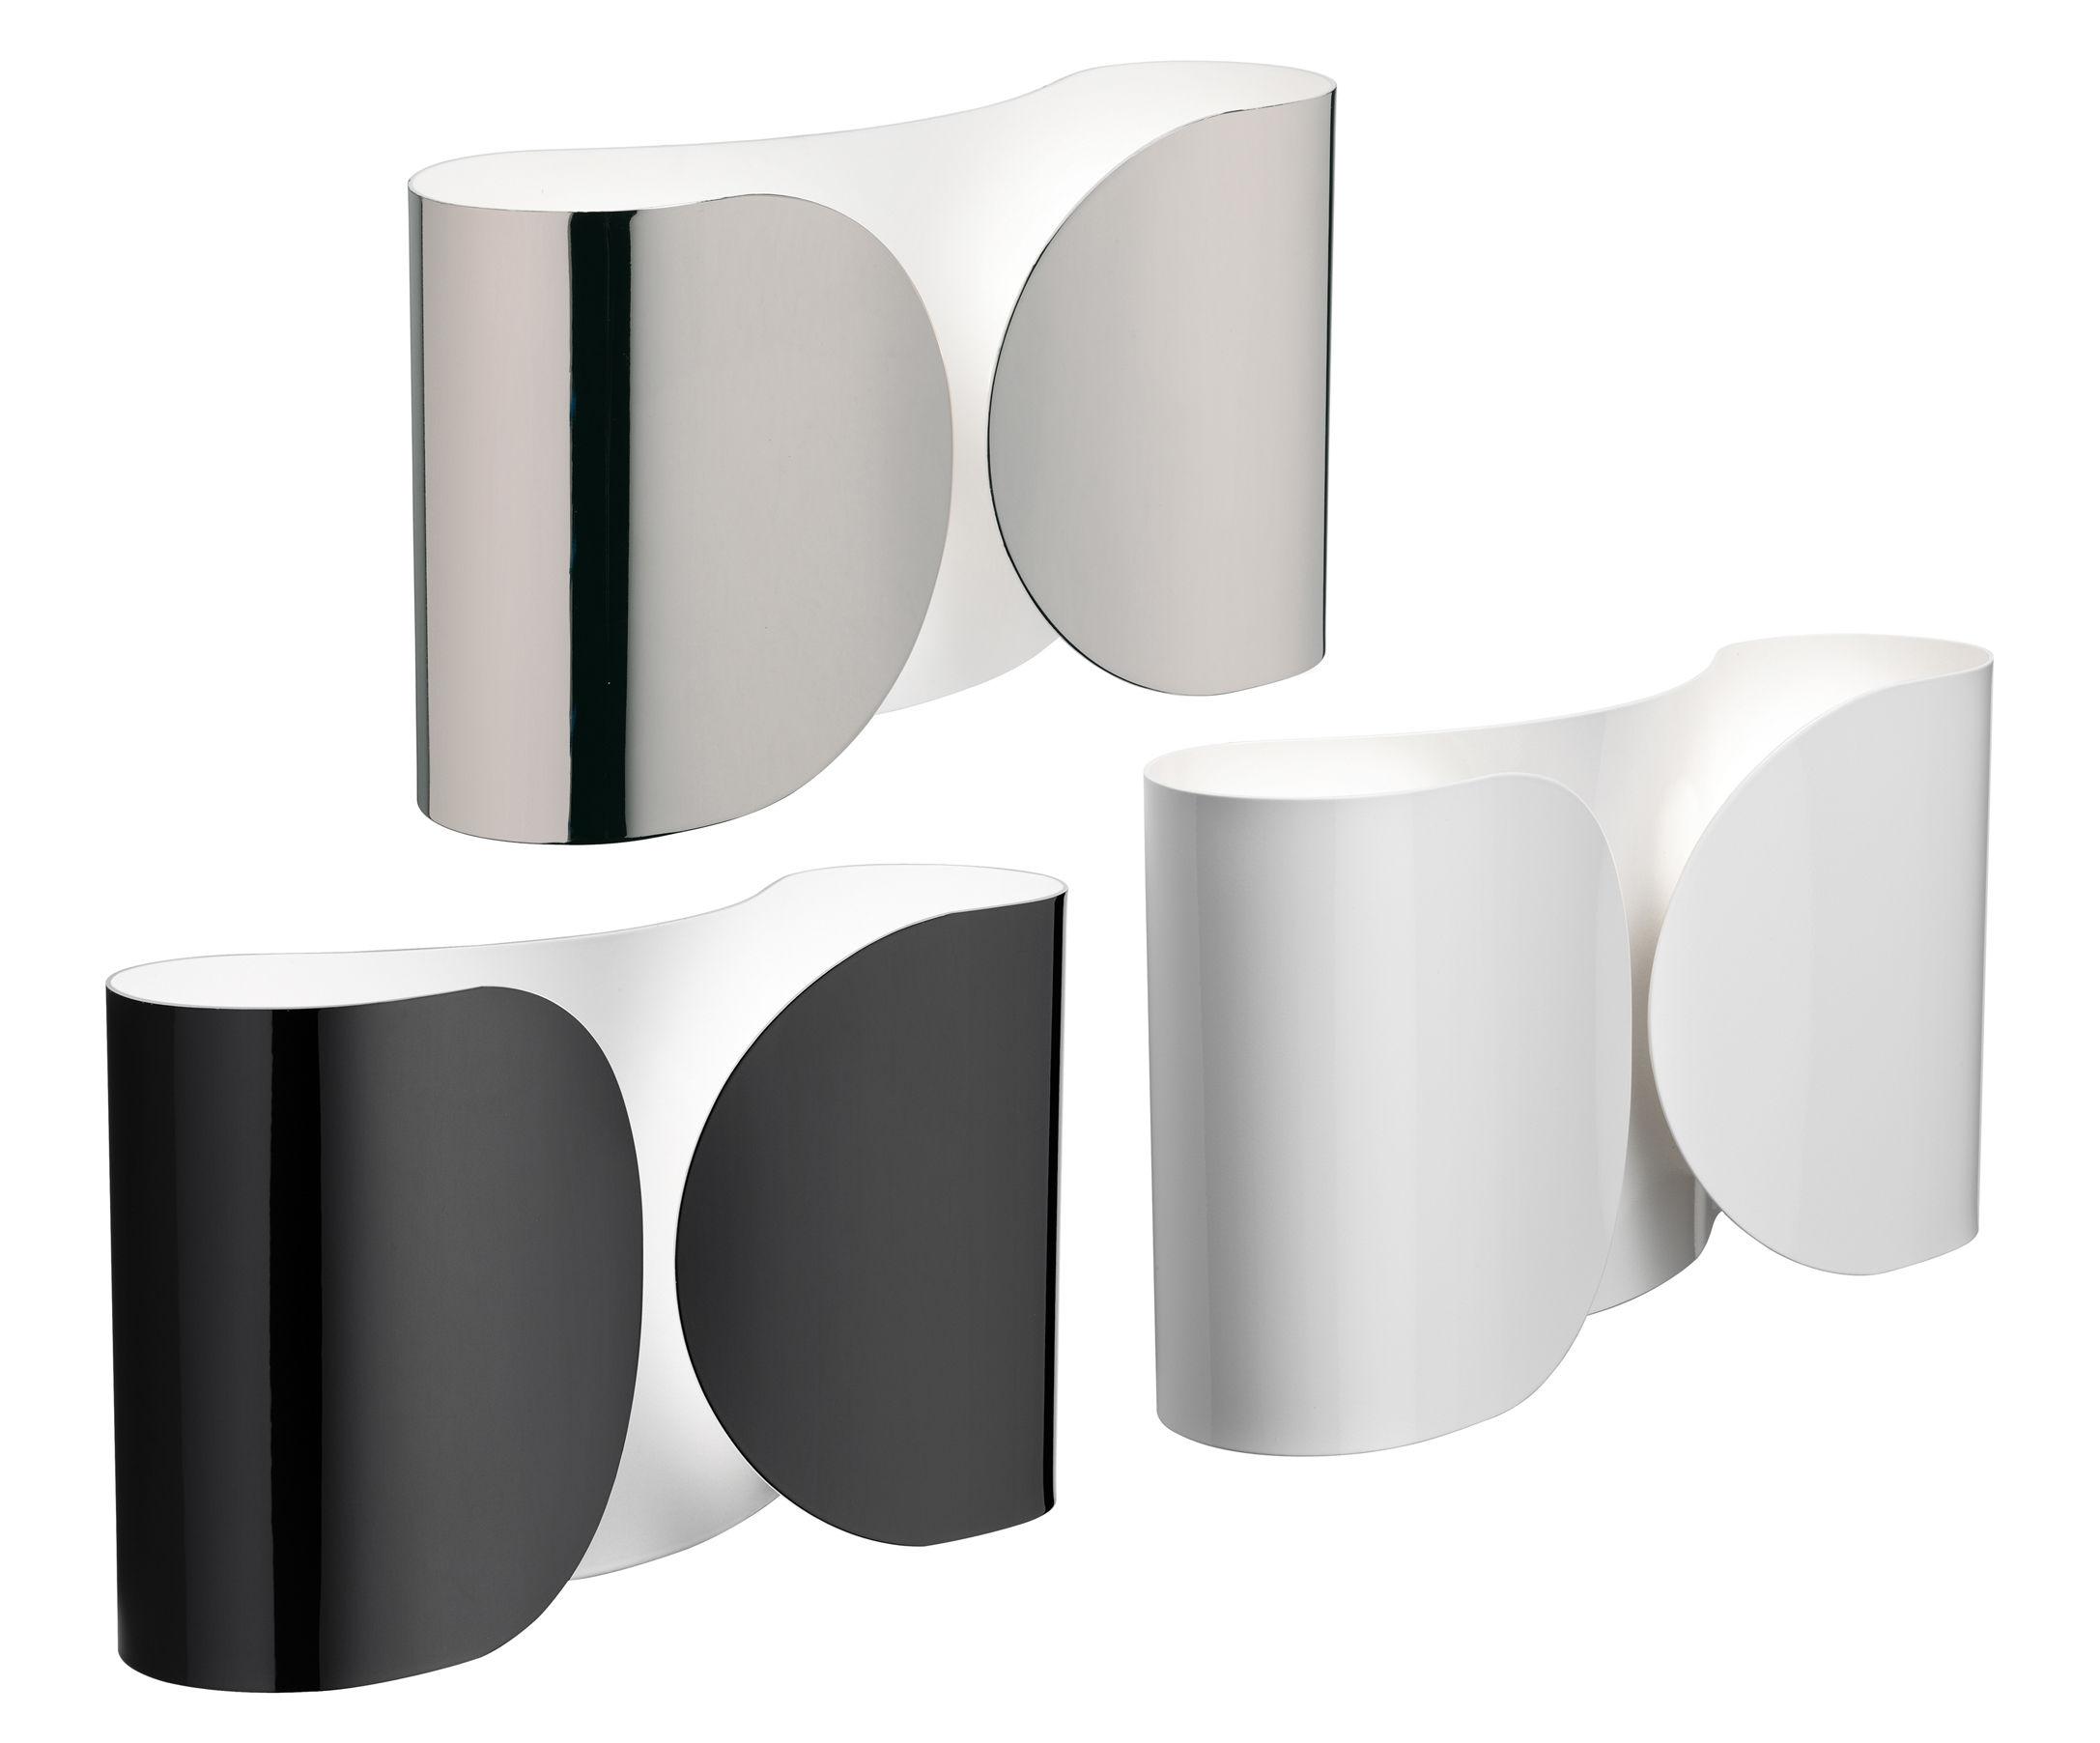 Foglio applique nero brillante by flos made in design